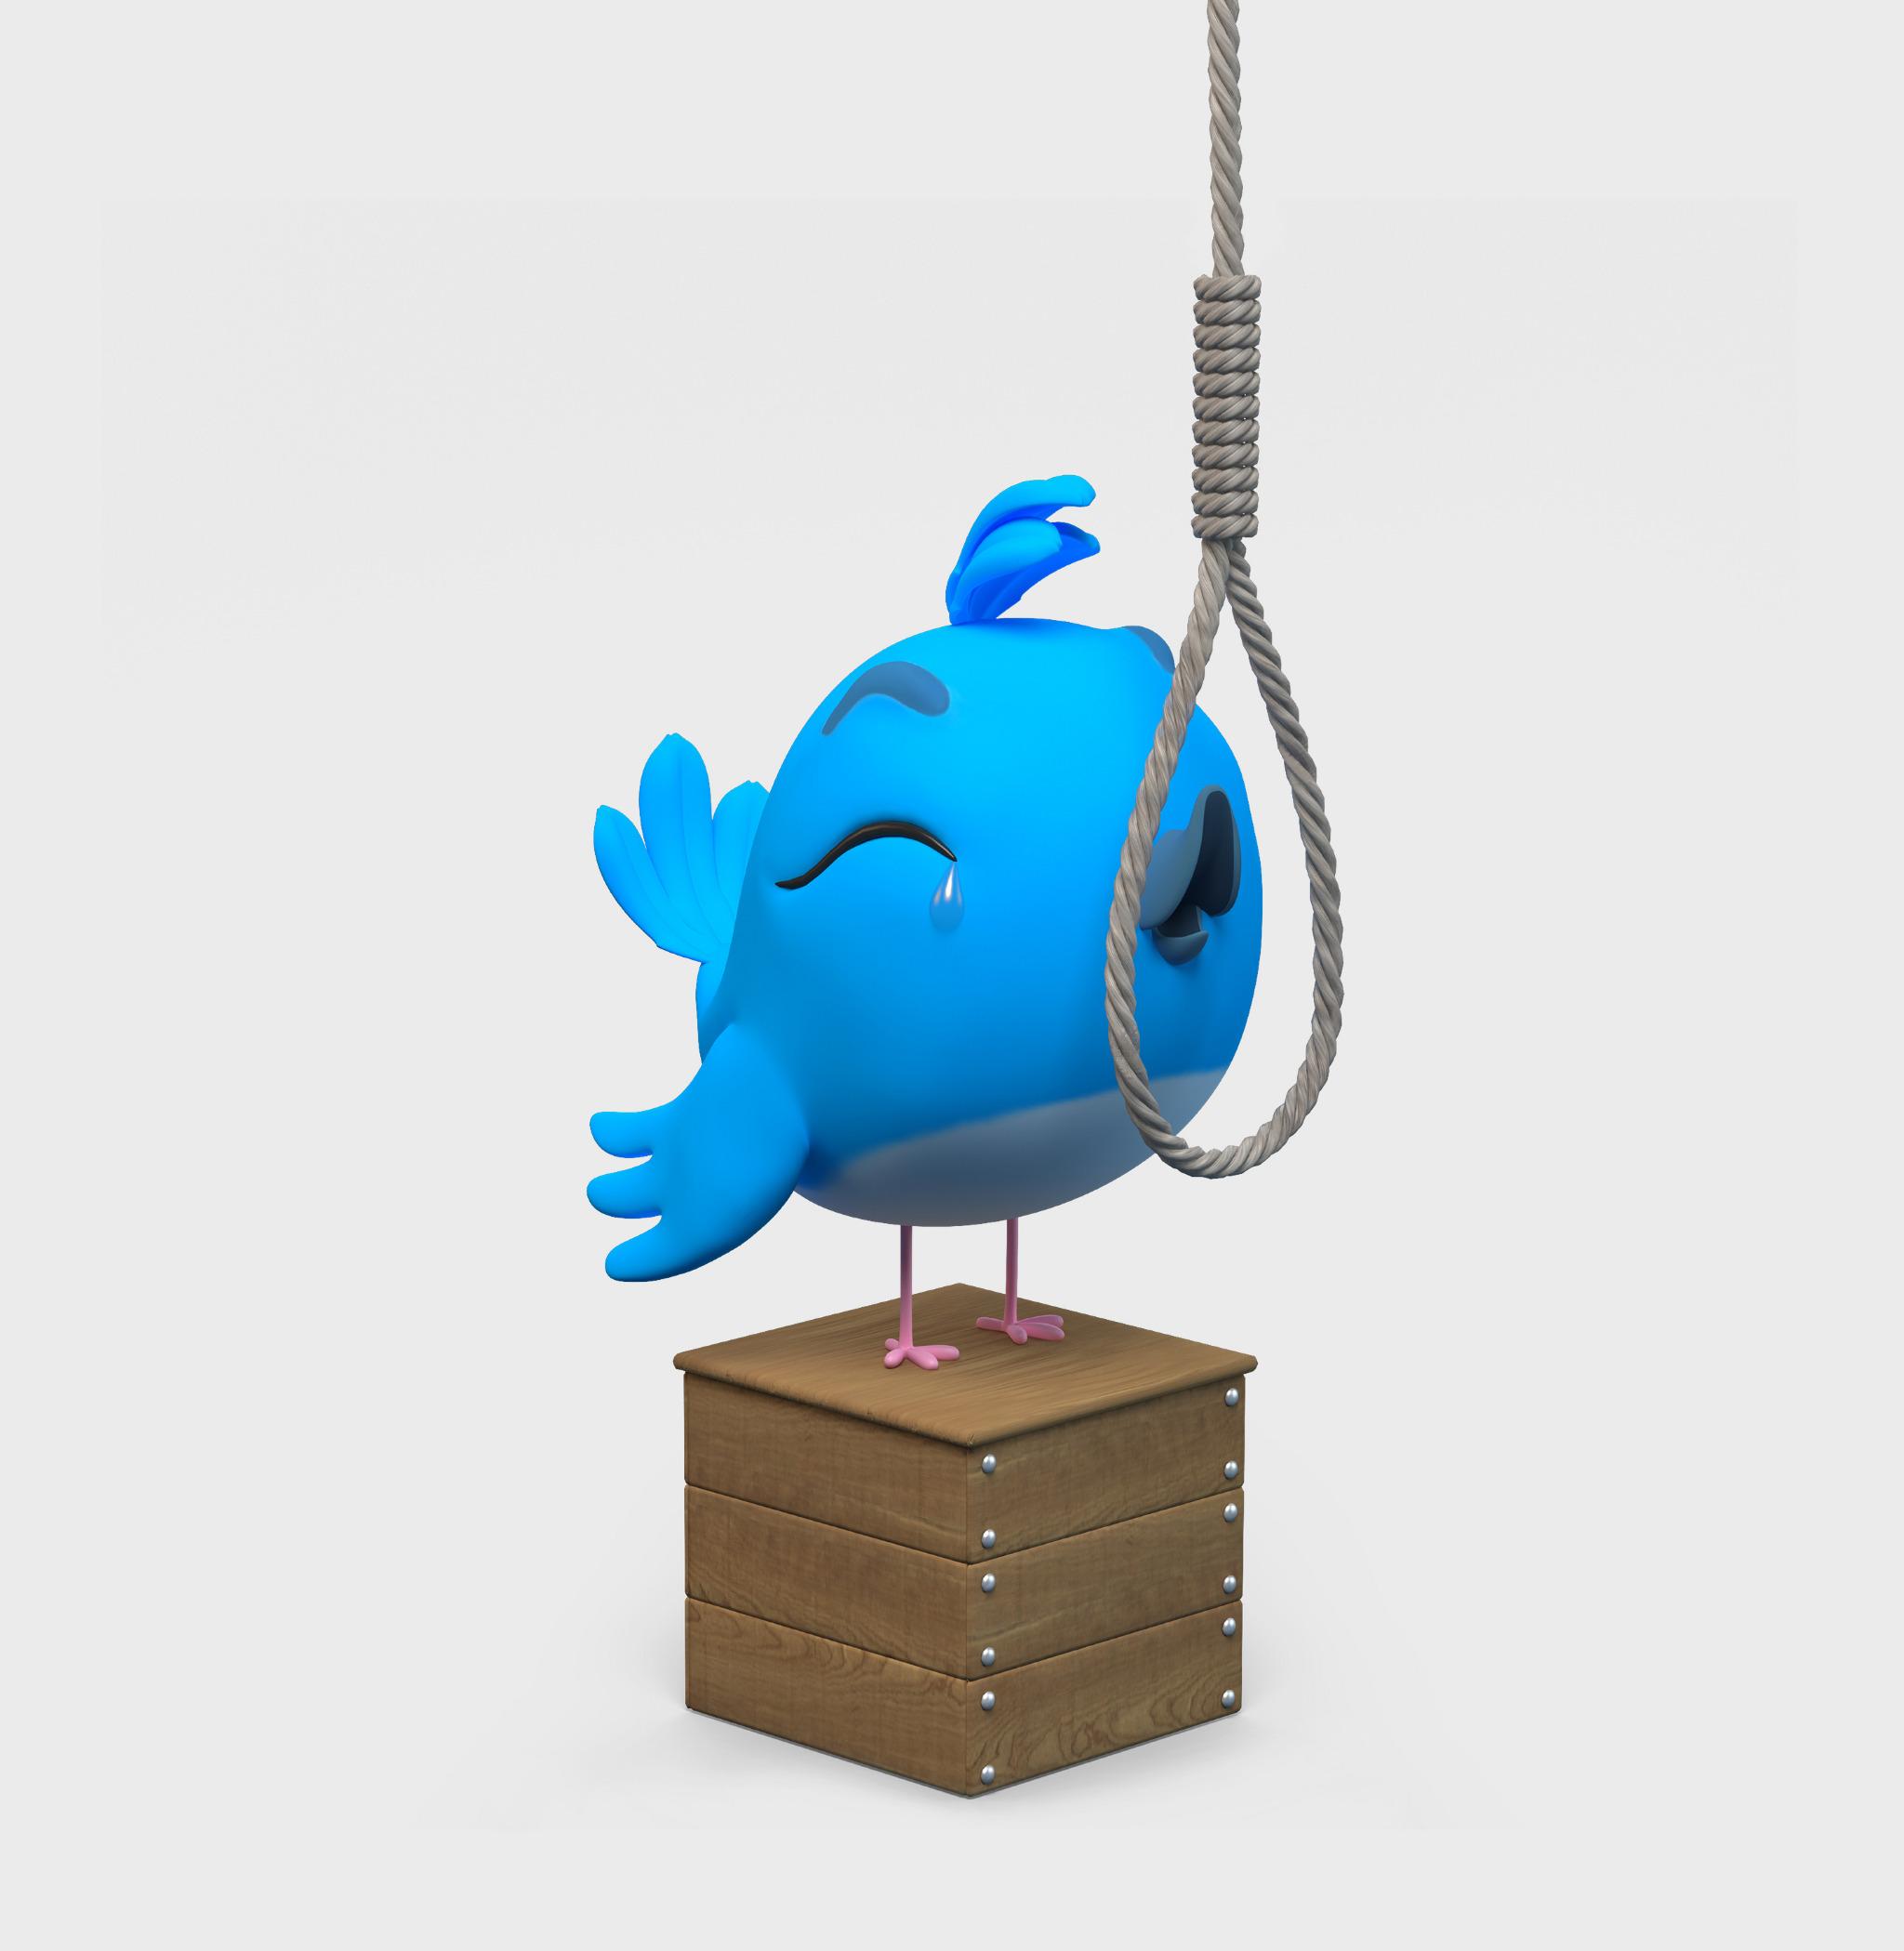 Twitter-Bird-Bloomberg-Businessweek-Hangin_o.jpg